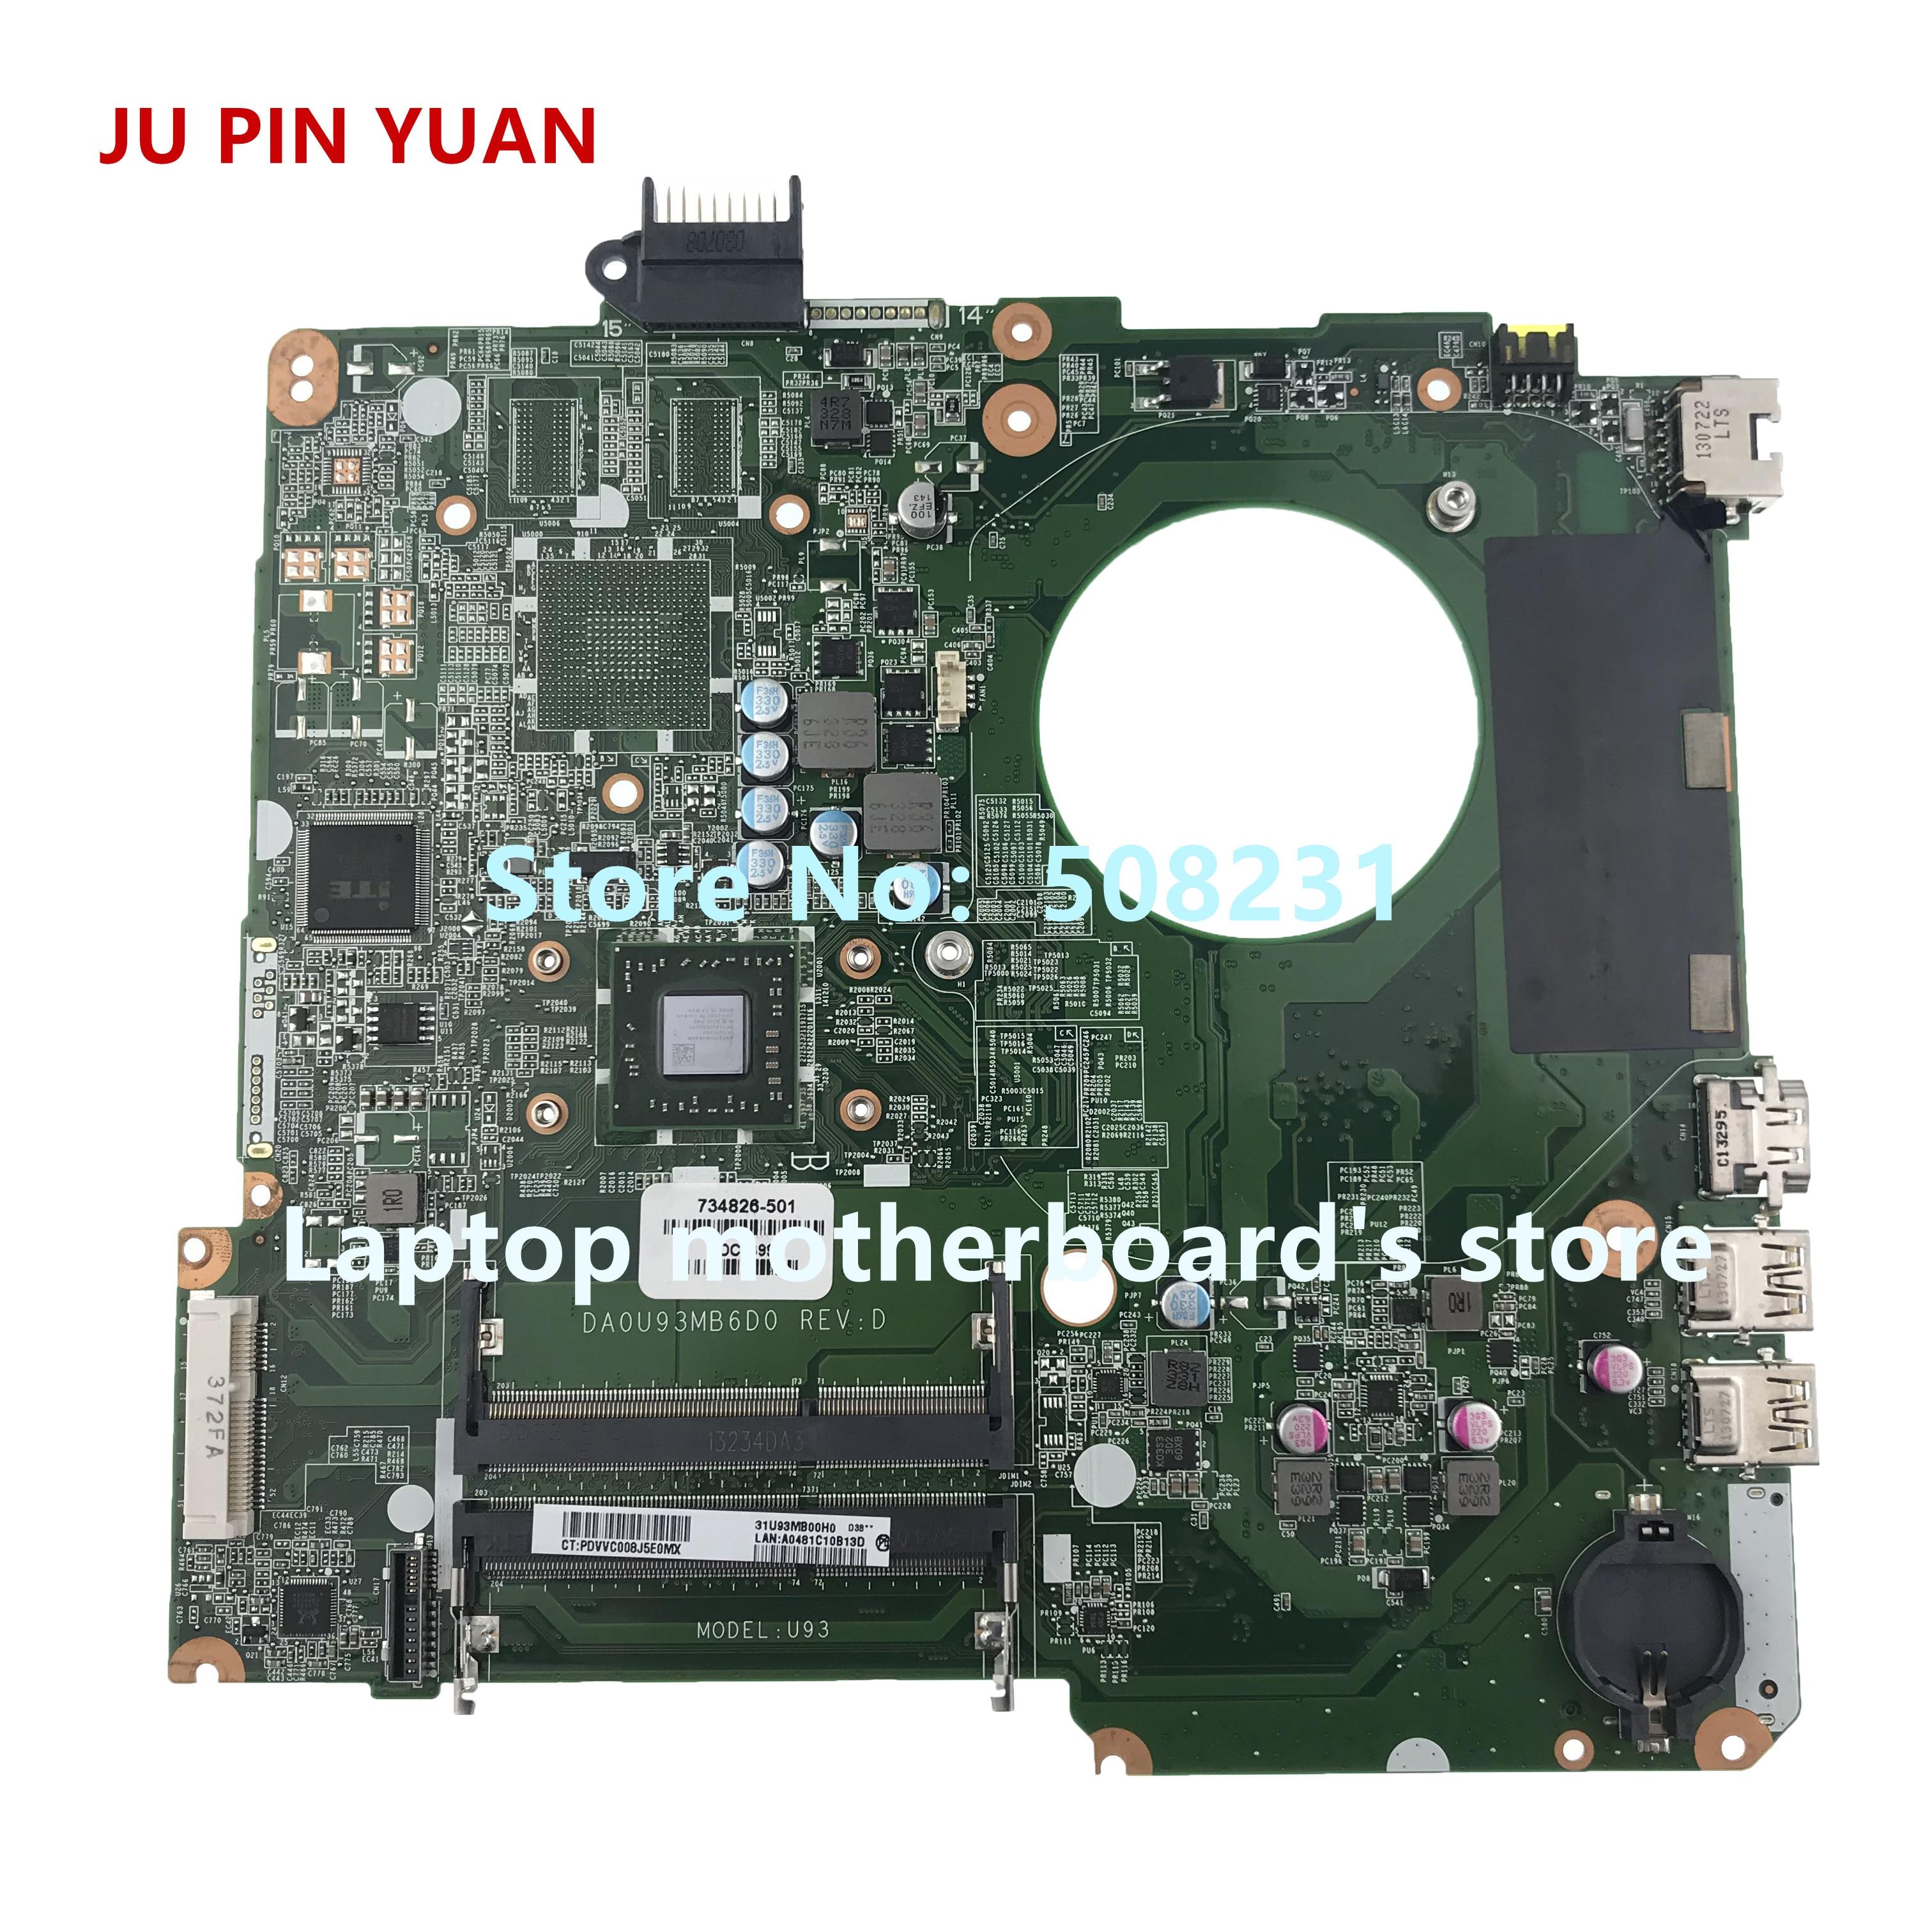 JU PIN YUAN-اللوحة الأم للكمبيوتر المحمول HP PAVILION 15-N 15-F 15Z-N ، تم اختبارها بالكامل ، 734826-501 734826-001 U93 DA0U93MB6D0